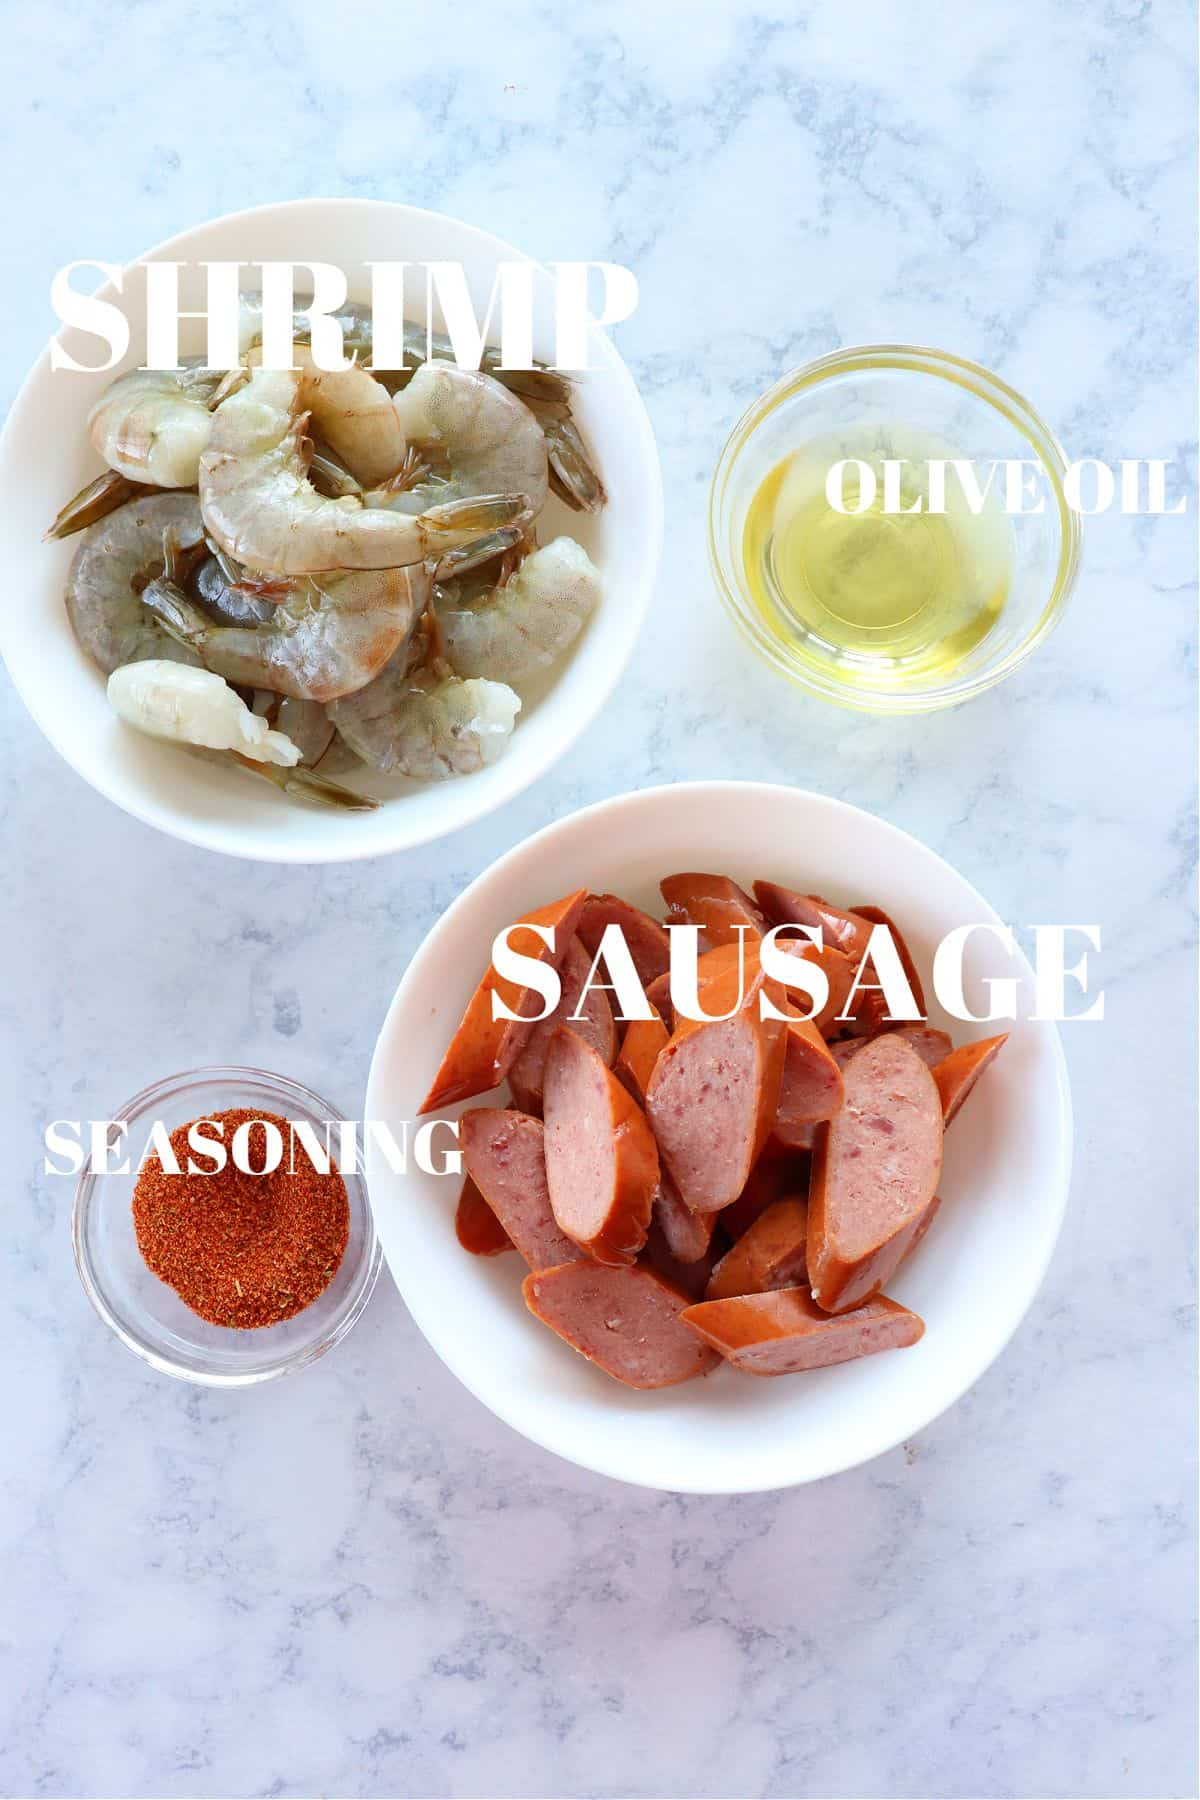 shrimp and sausage skewers ingredients 1 Shrimp and Sausage Skewers (Keto Friendly)